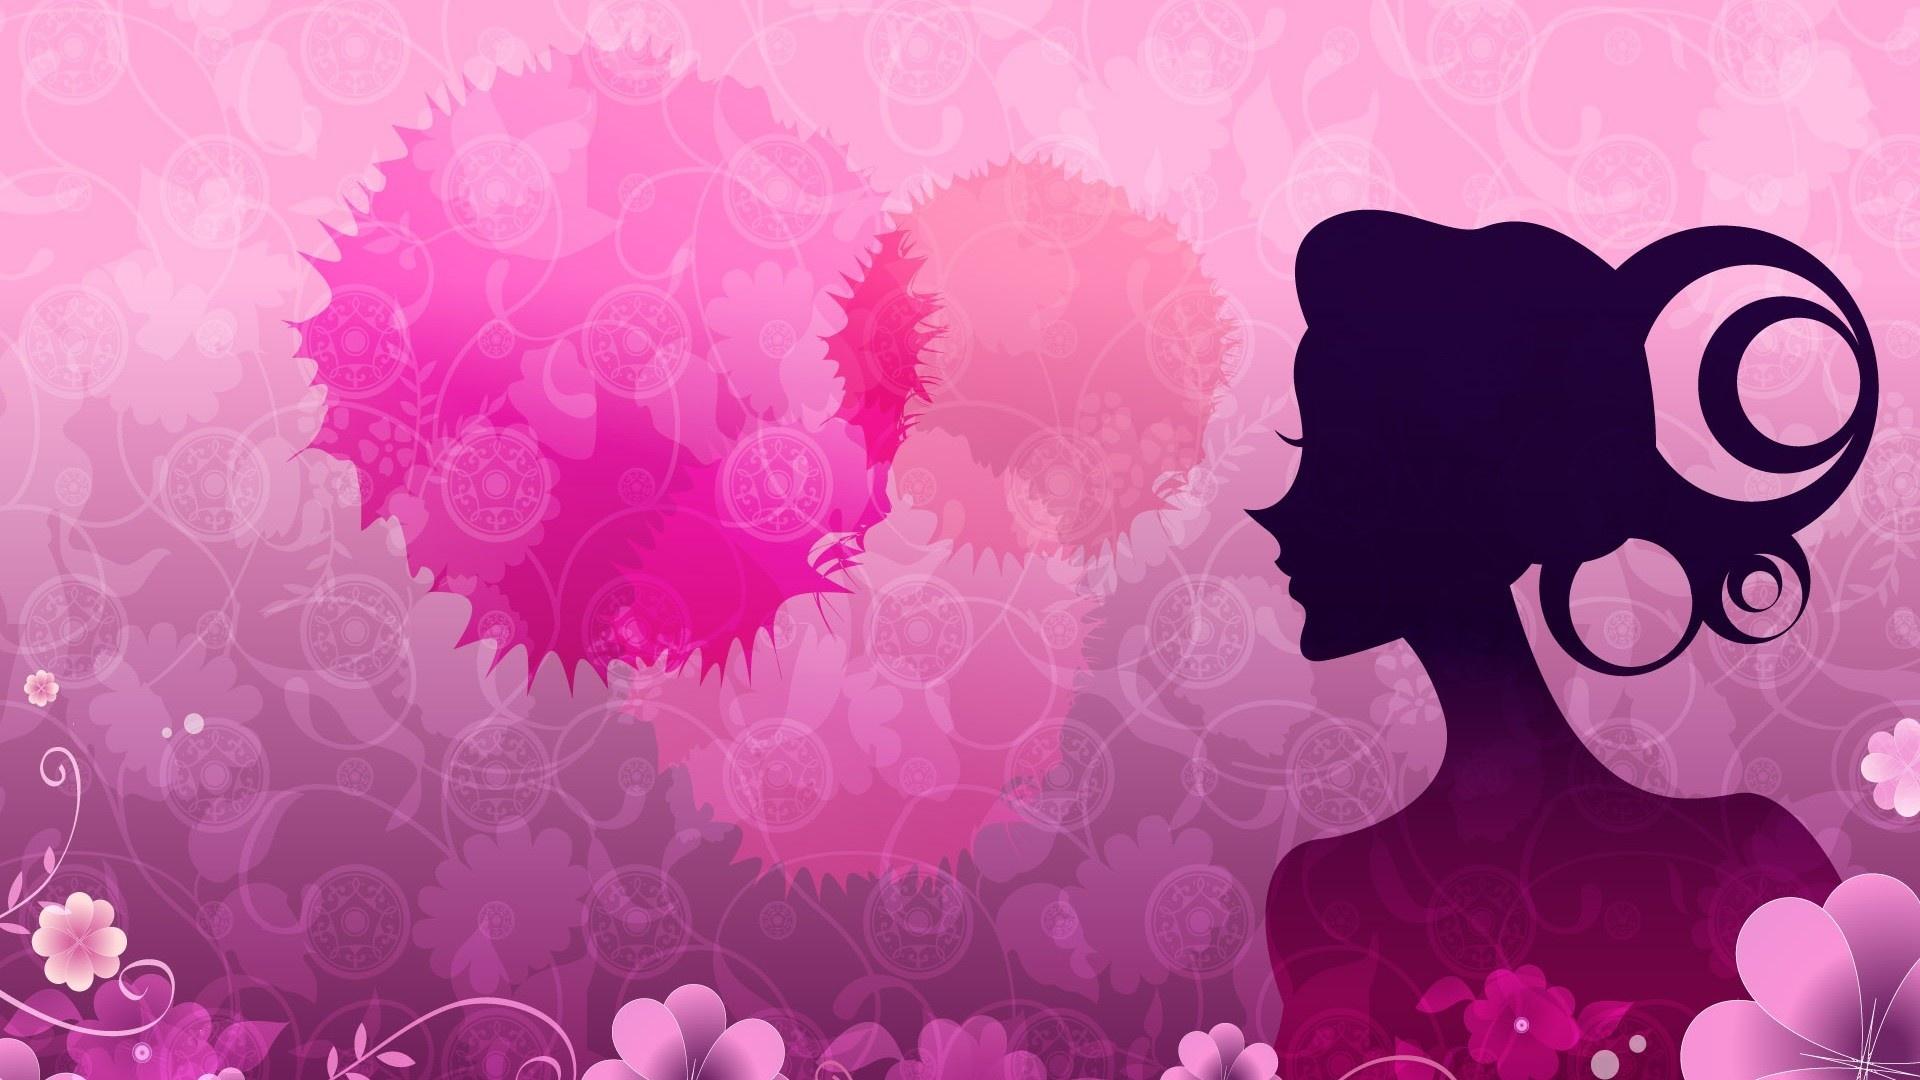 Happy Women's Day Wallpaper theme